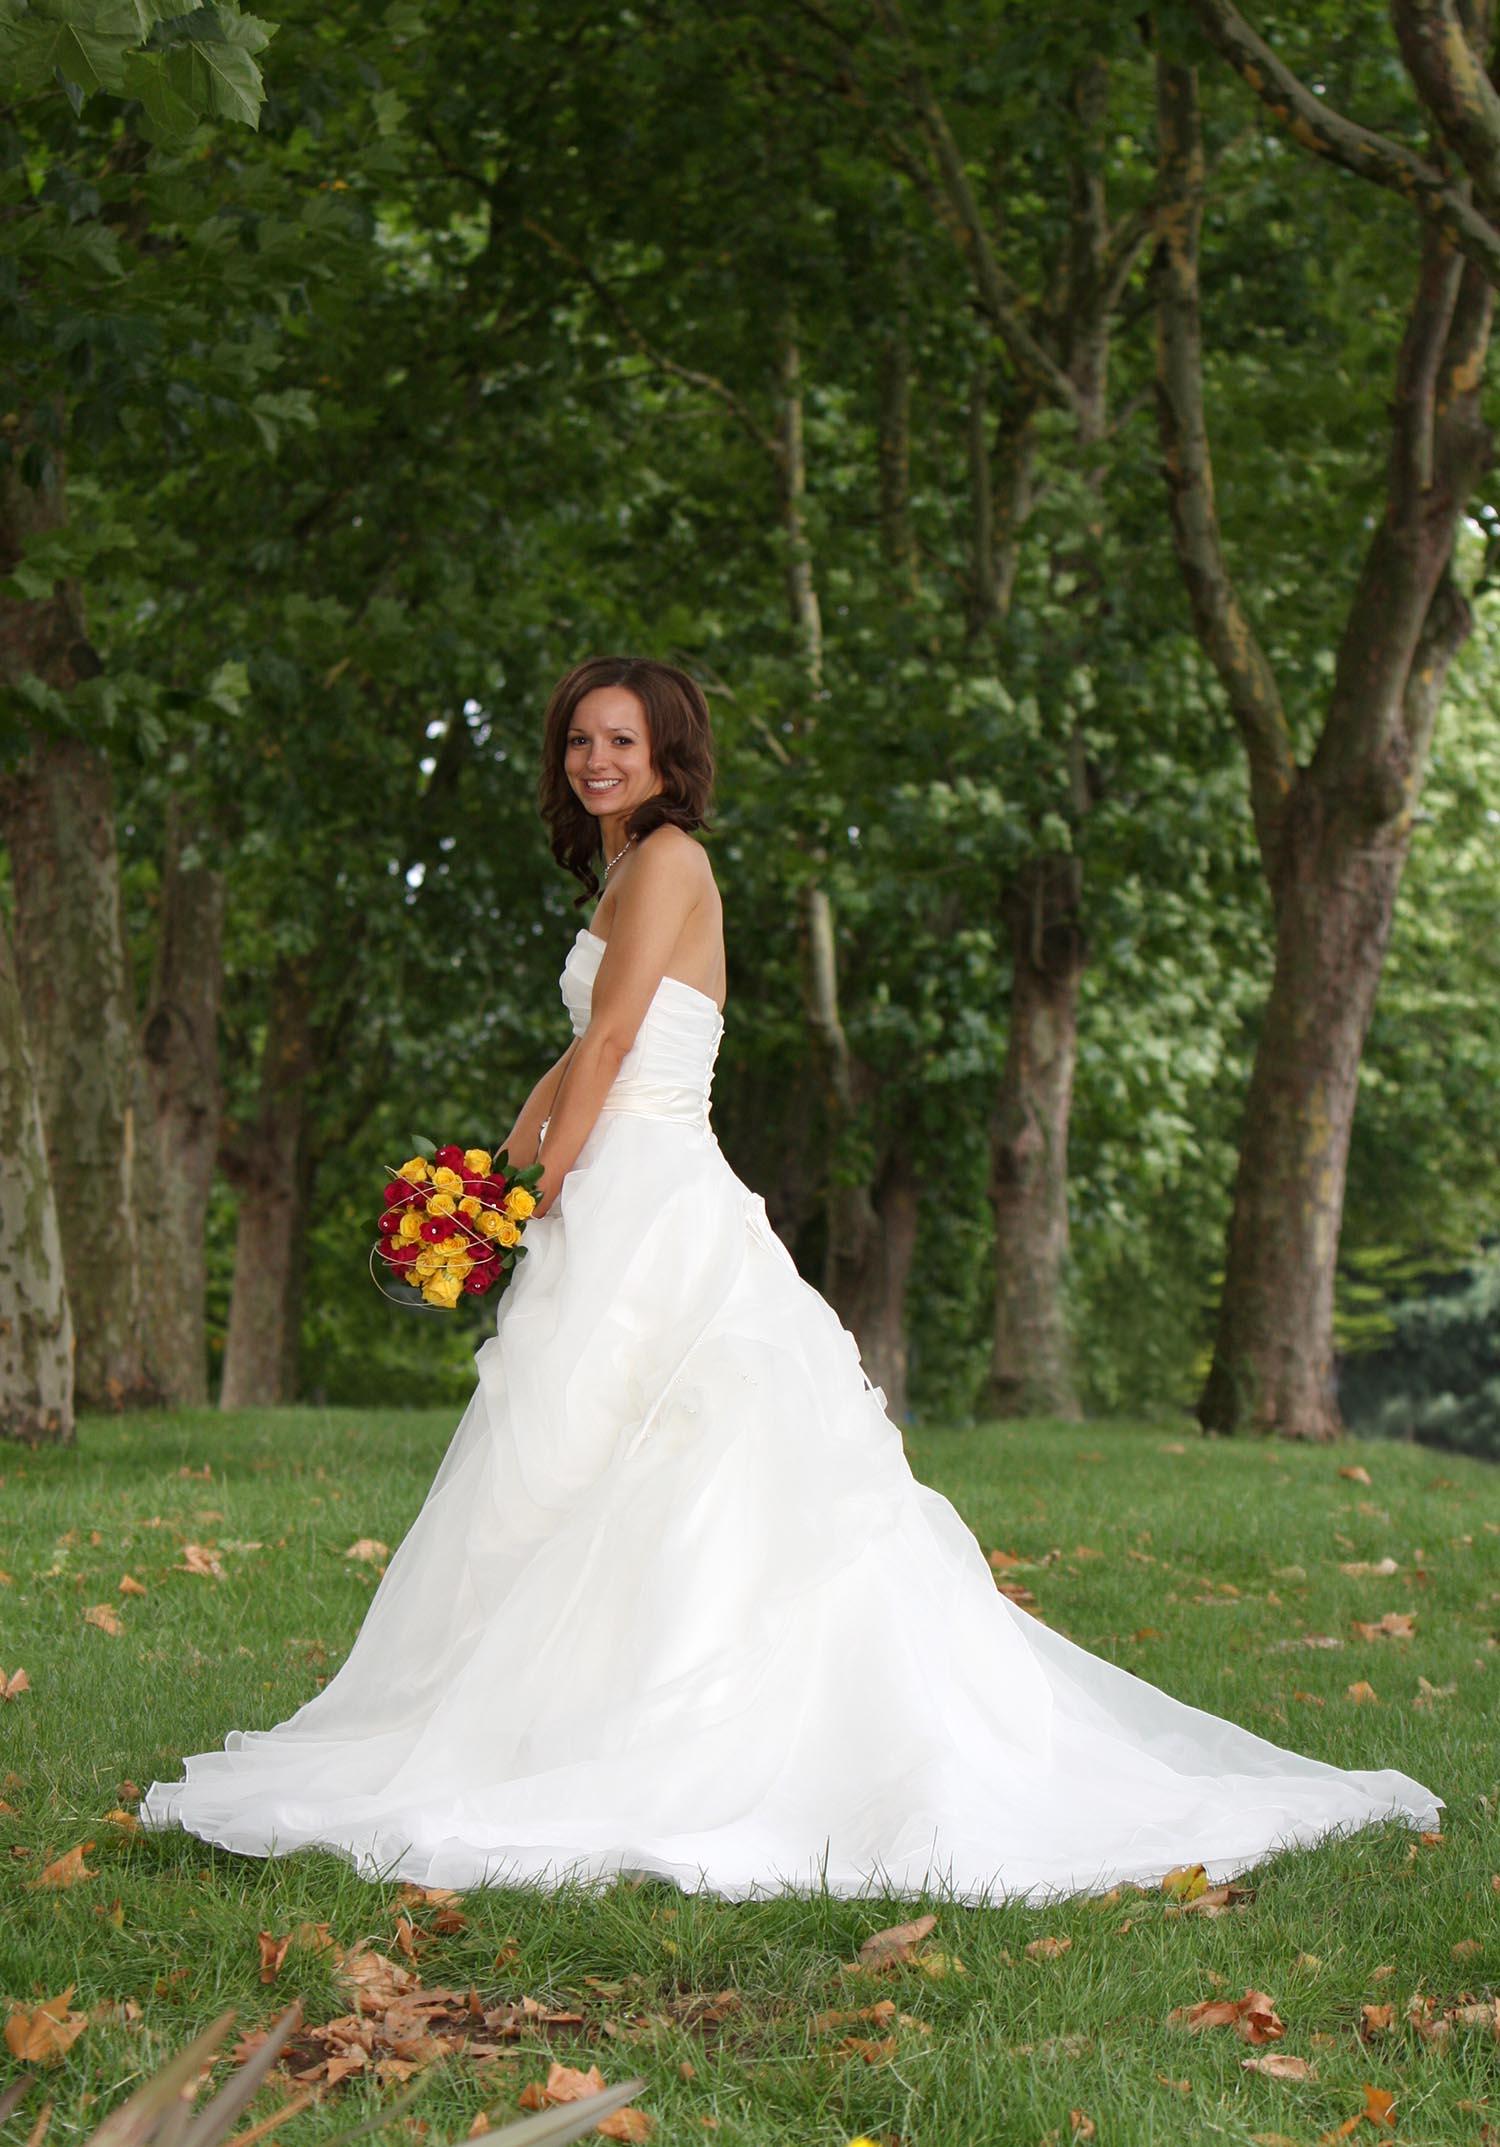 Wedding Photographer Bristol | Black Tie Portraits